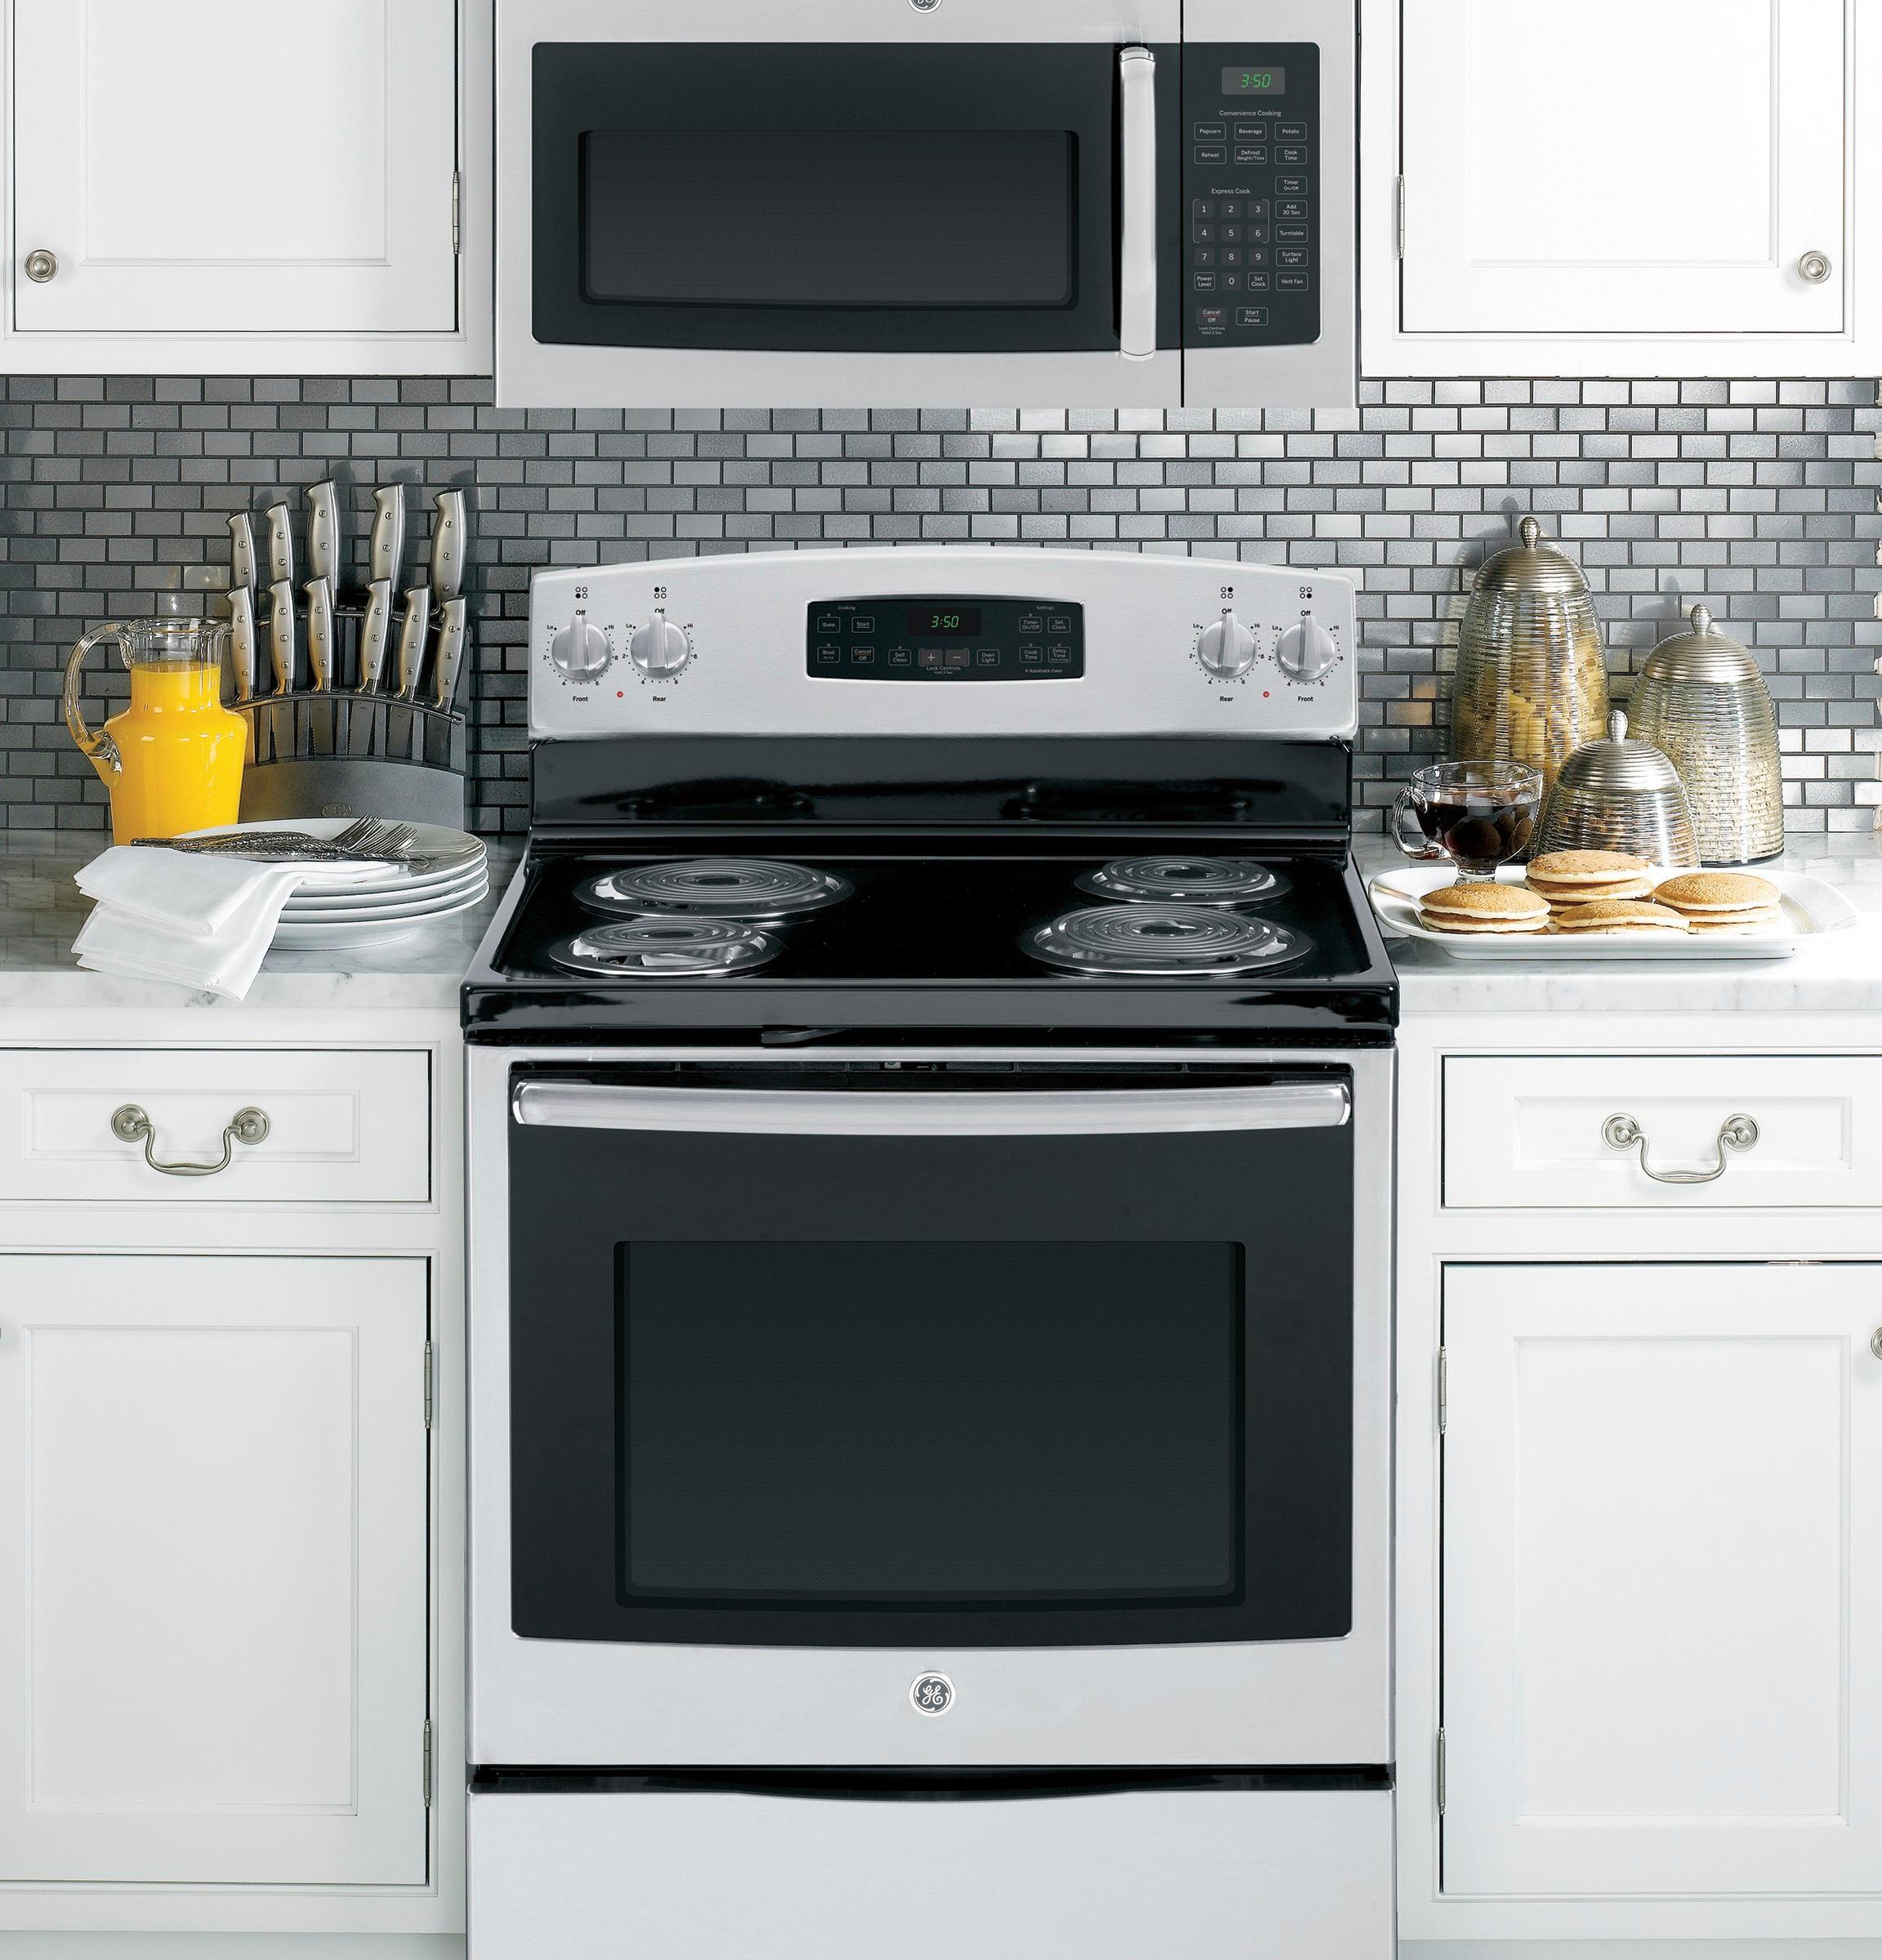 https www bestbuy com site ge 1 6 cu ft over the range microwave stainless steel 1624532 p skuid 1624532